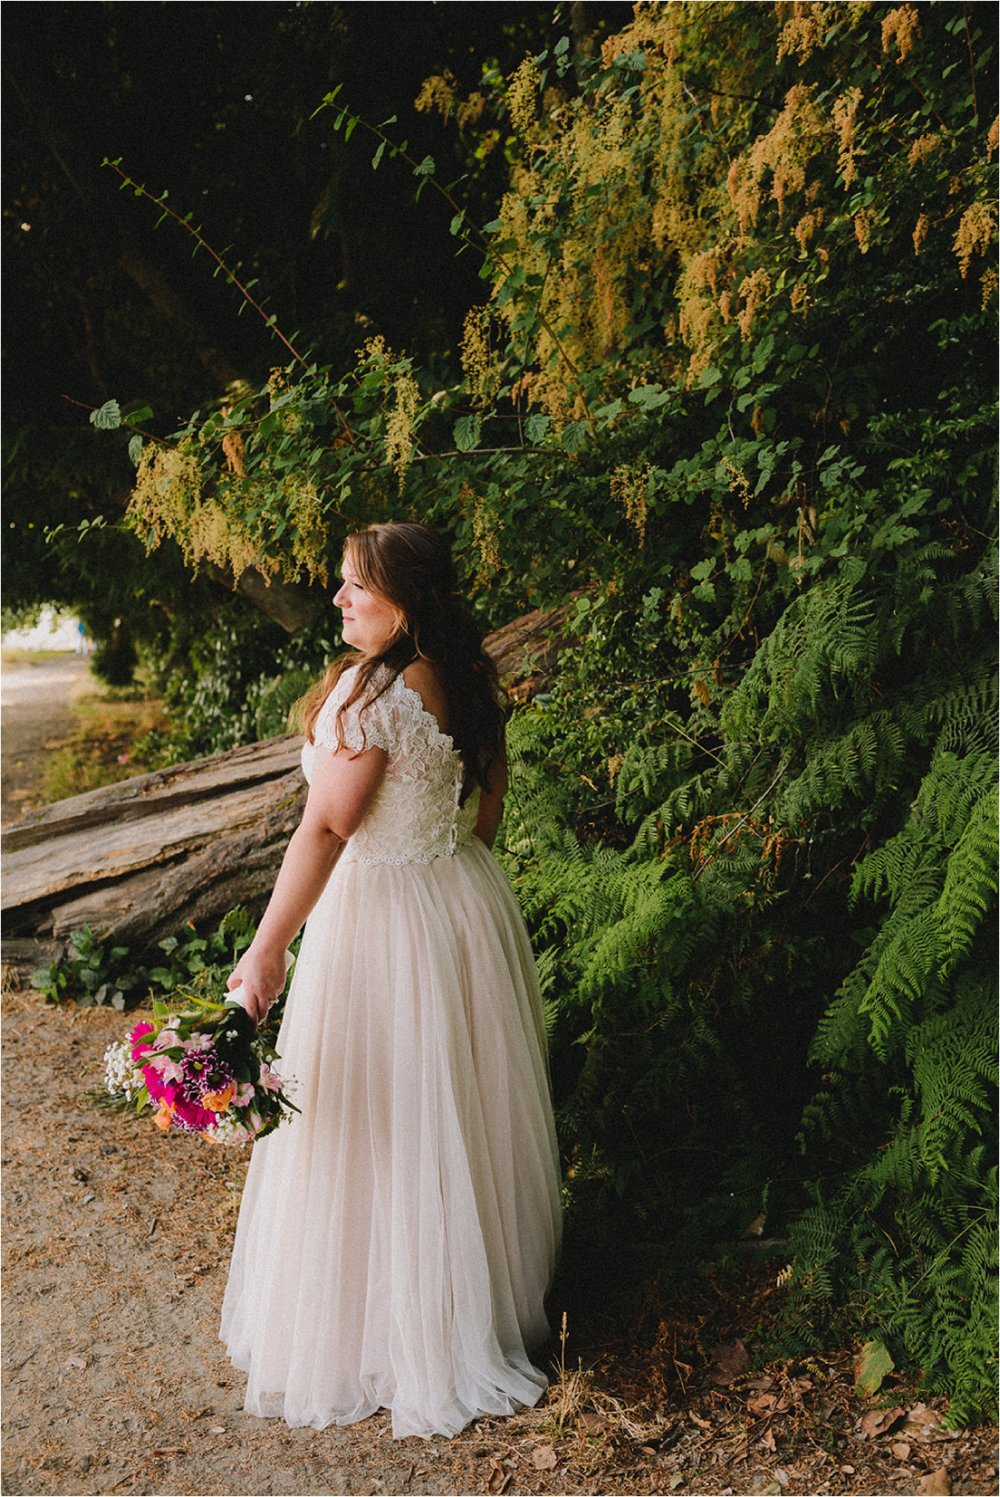 owen-beach-priest-point-park-tacoma-washington-elopement-jannicka-mayte-anchorage-alaska-wedding-elopement-photographer (19).jpg